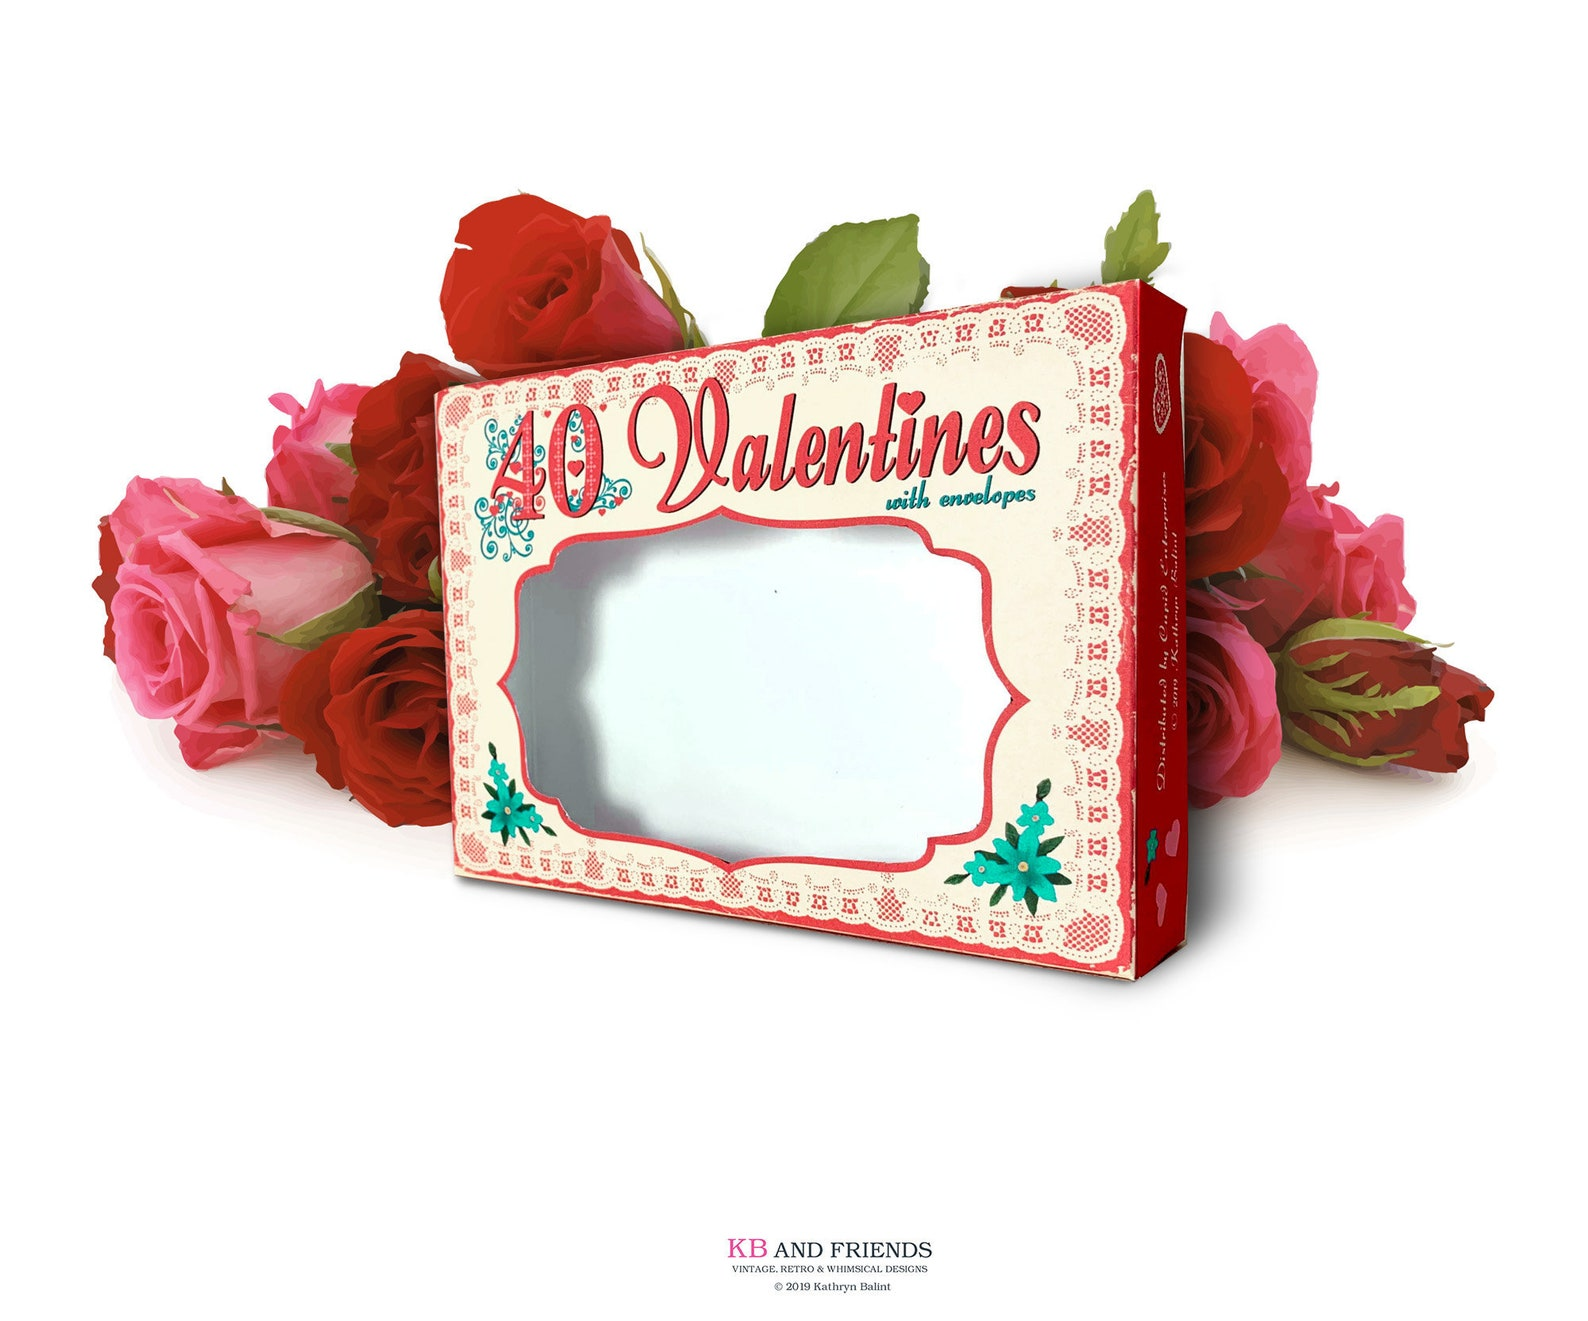 KB and Friends' Retro Valentines Box